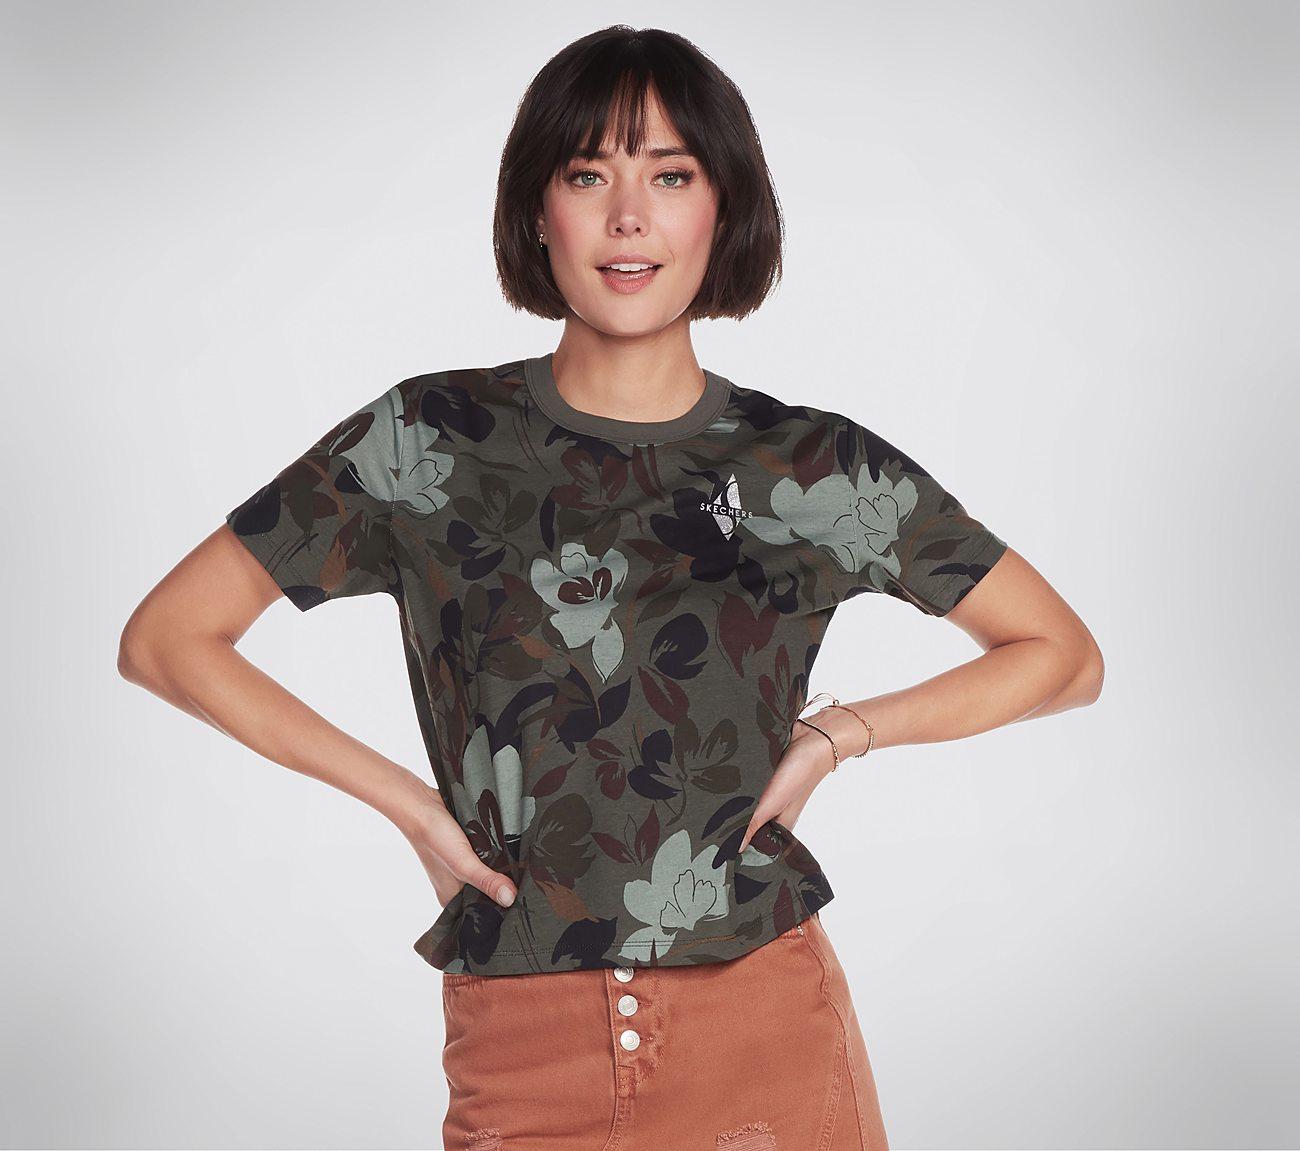 Skechers Apparel Floral Camo Tee Shirt